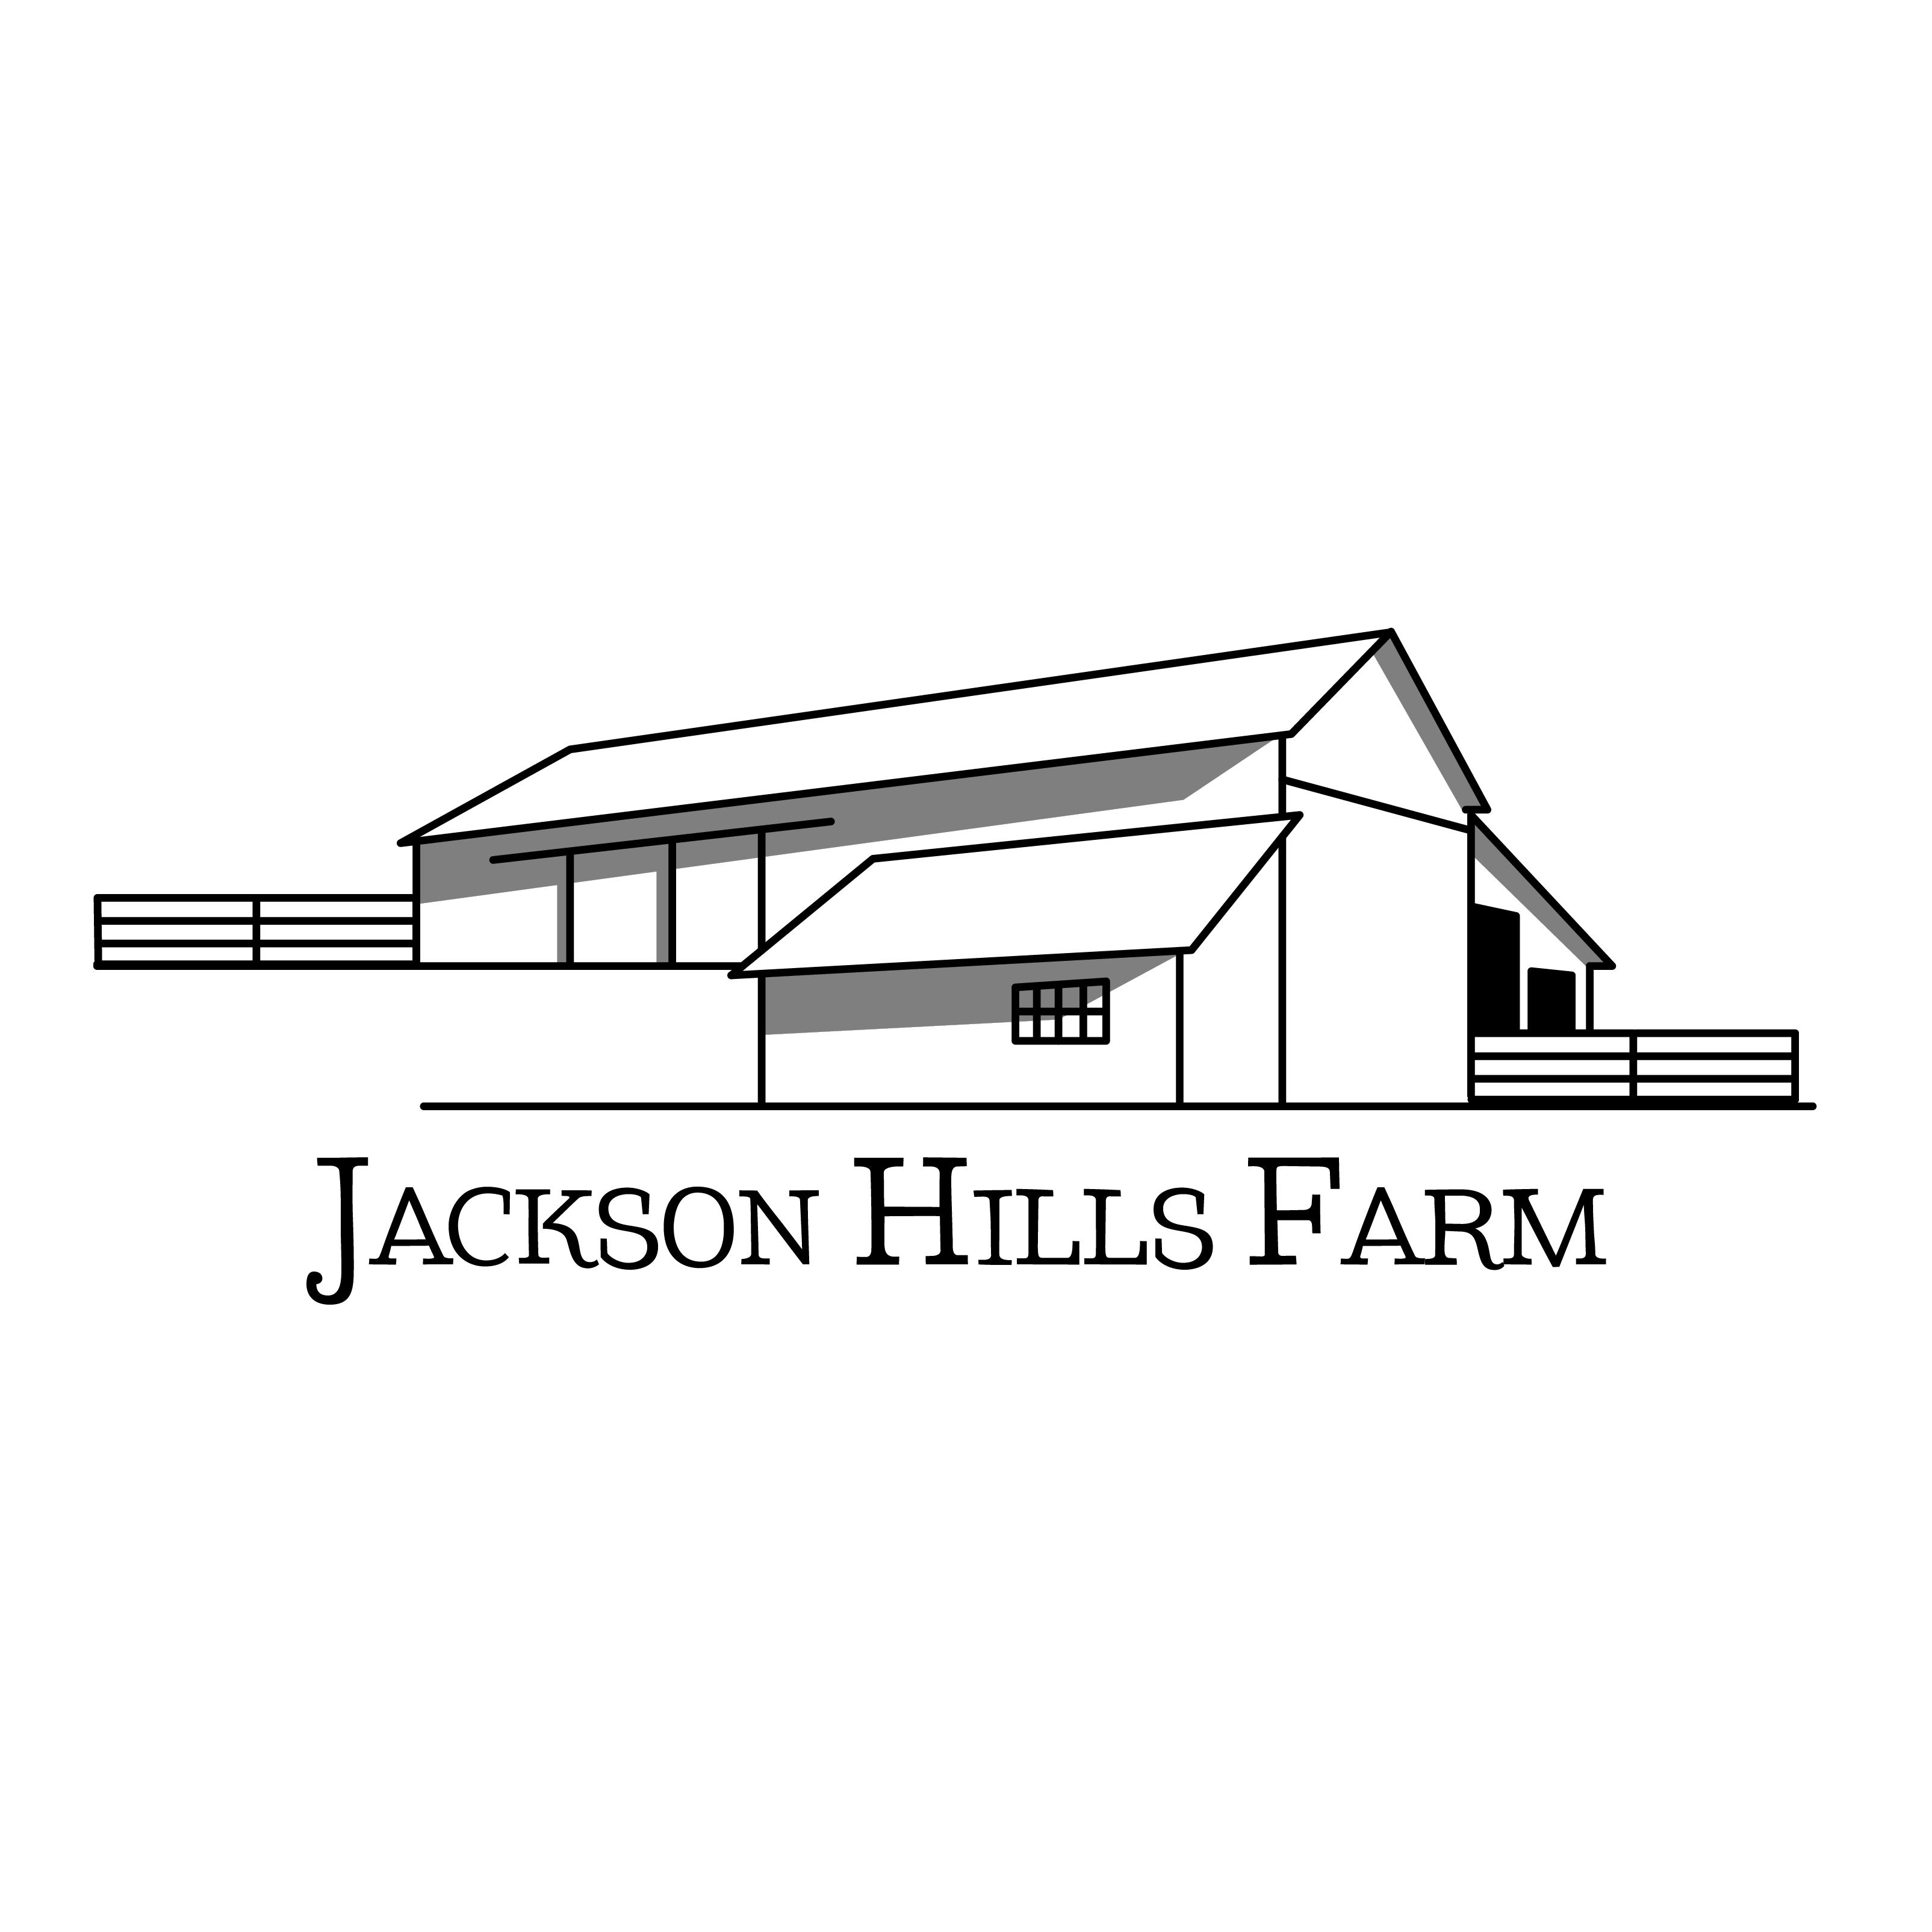 Jackson Hills Farm